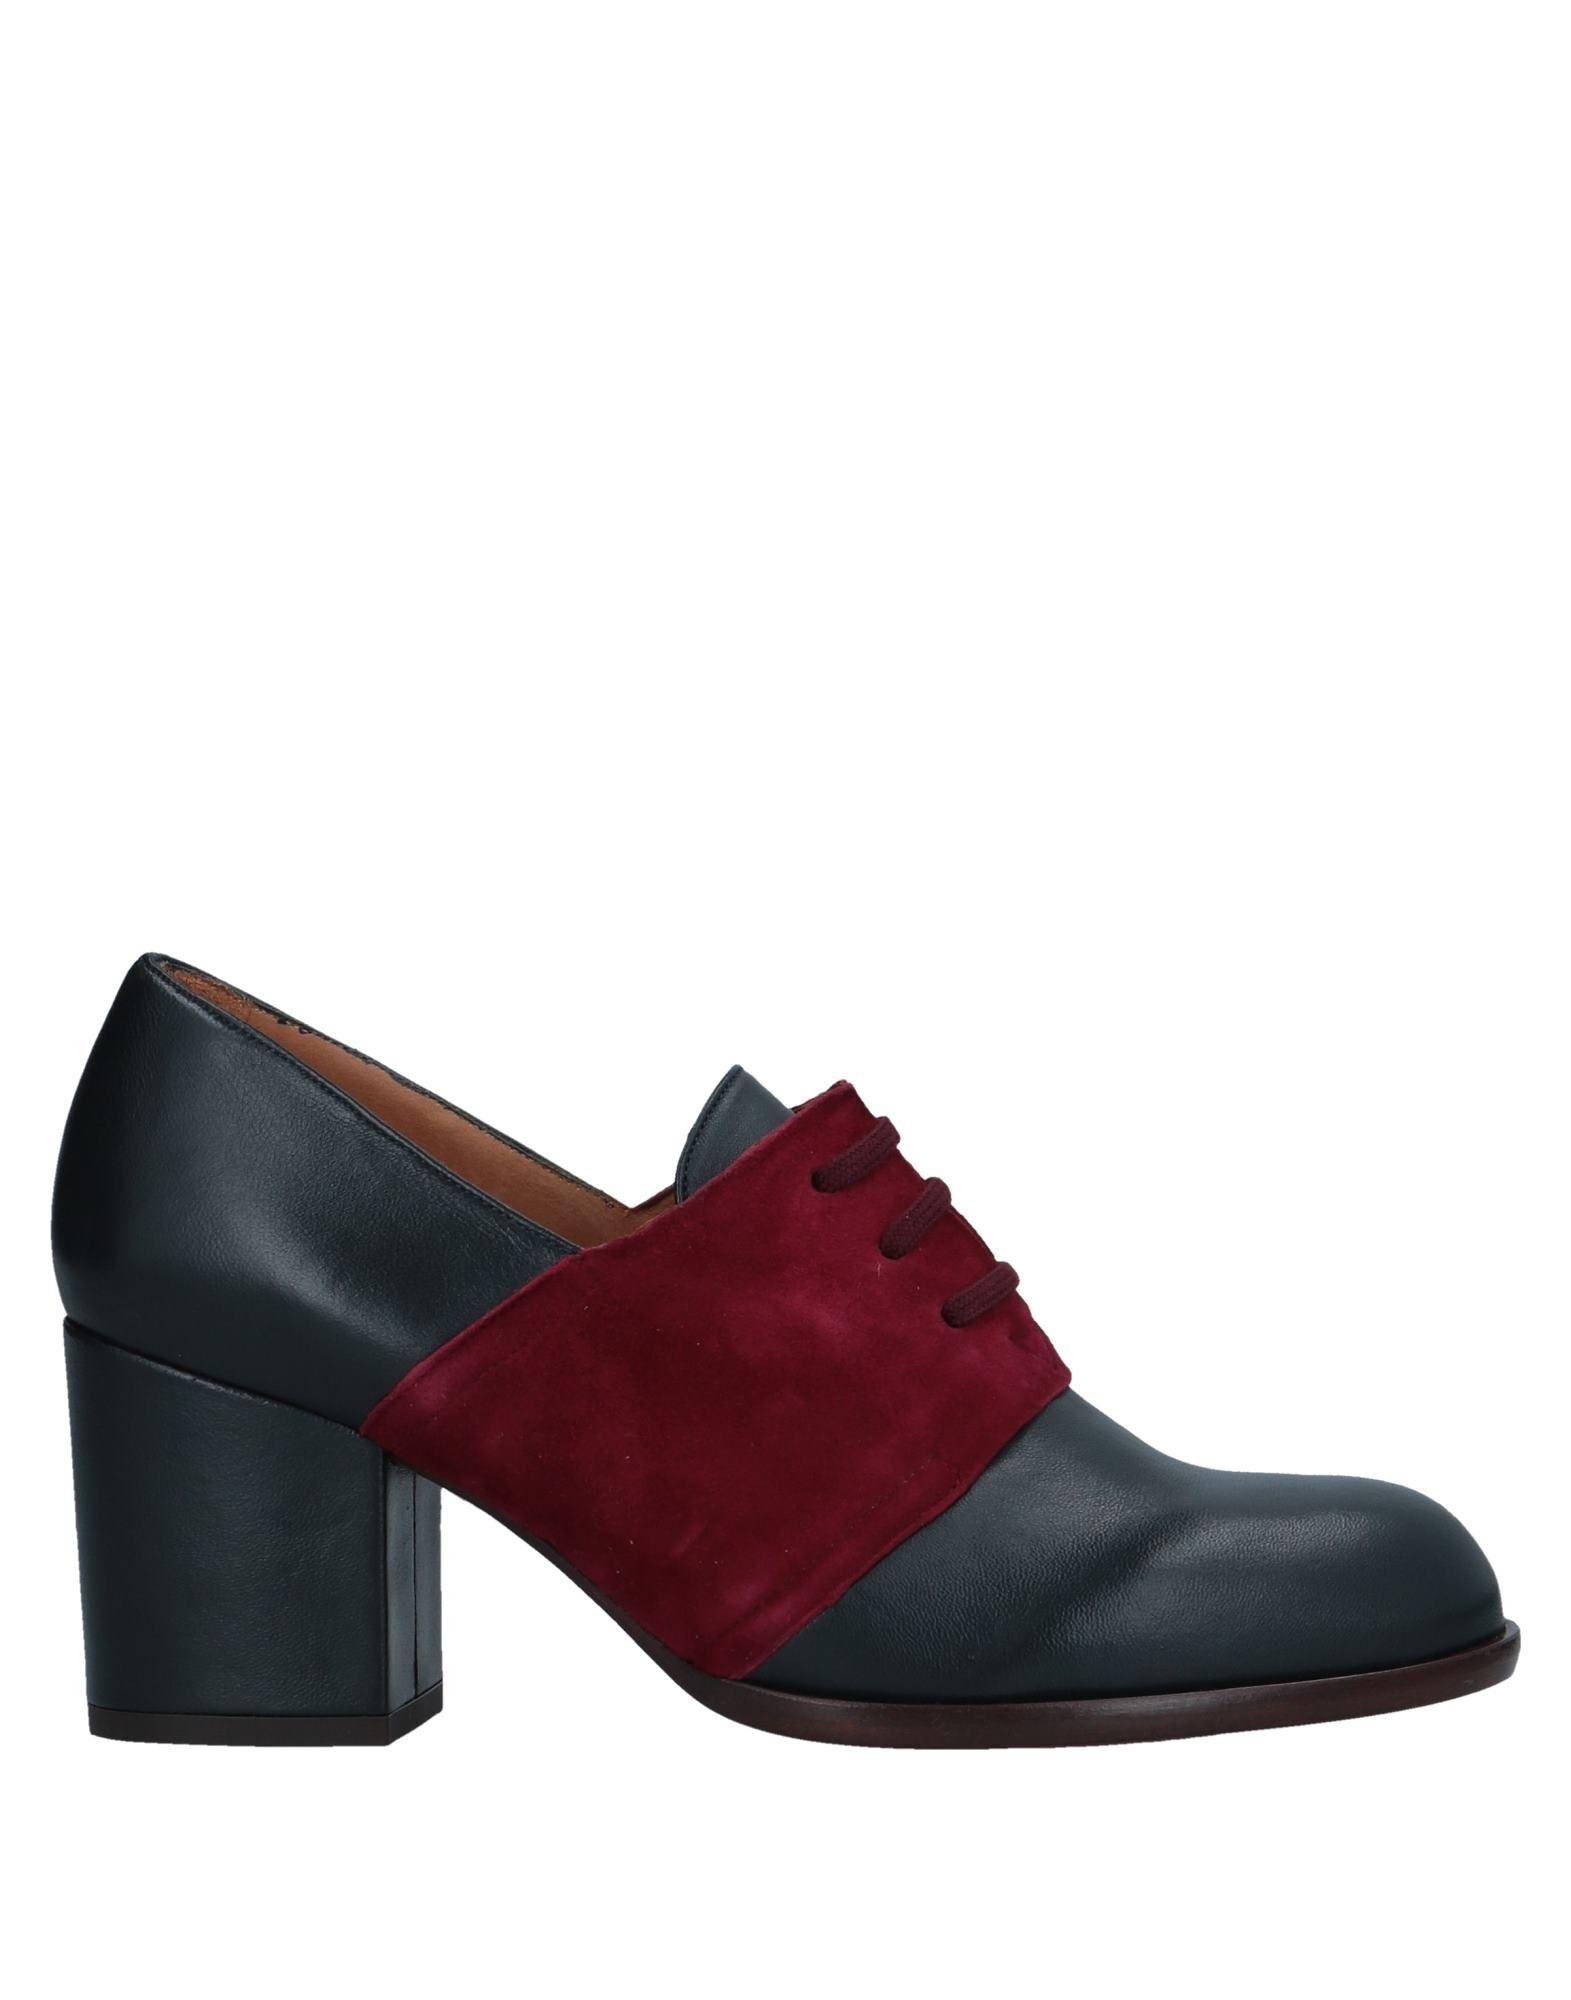 Moda barata y hermosa Zapato Zapato hermosa De Cordones Chie Mihara Mujer - Zapatos De Cordones Chie Mihara  Azul oscuro 92e8eb